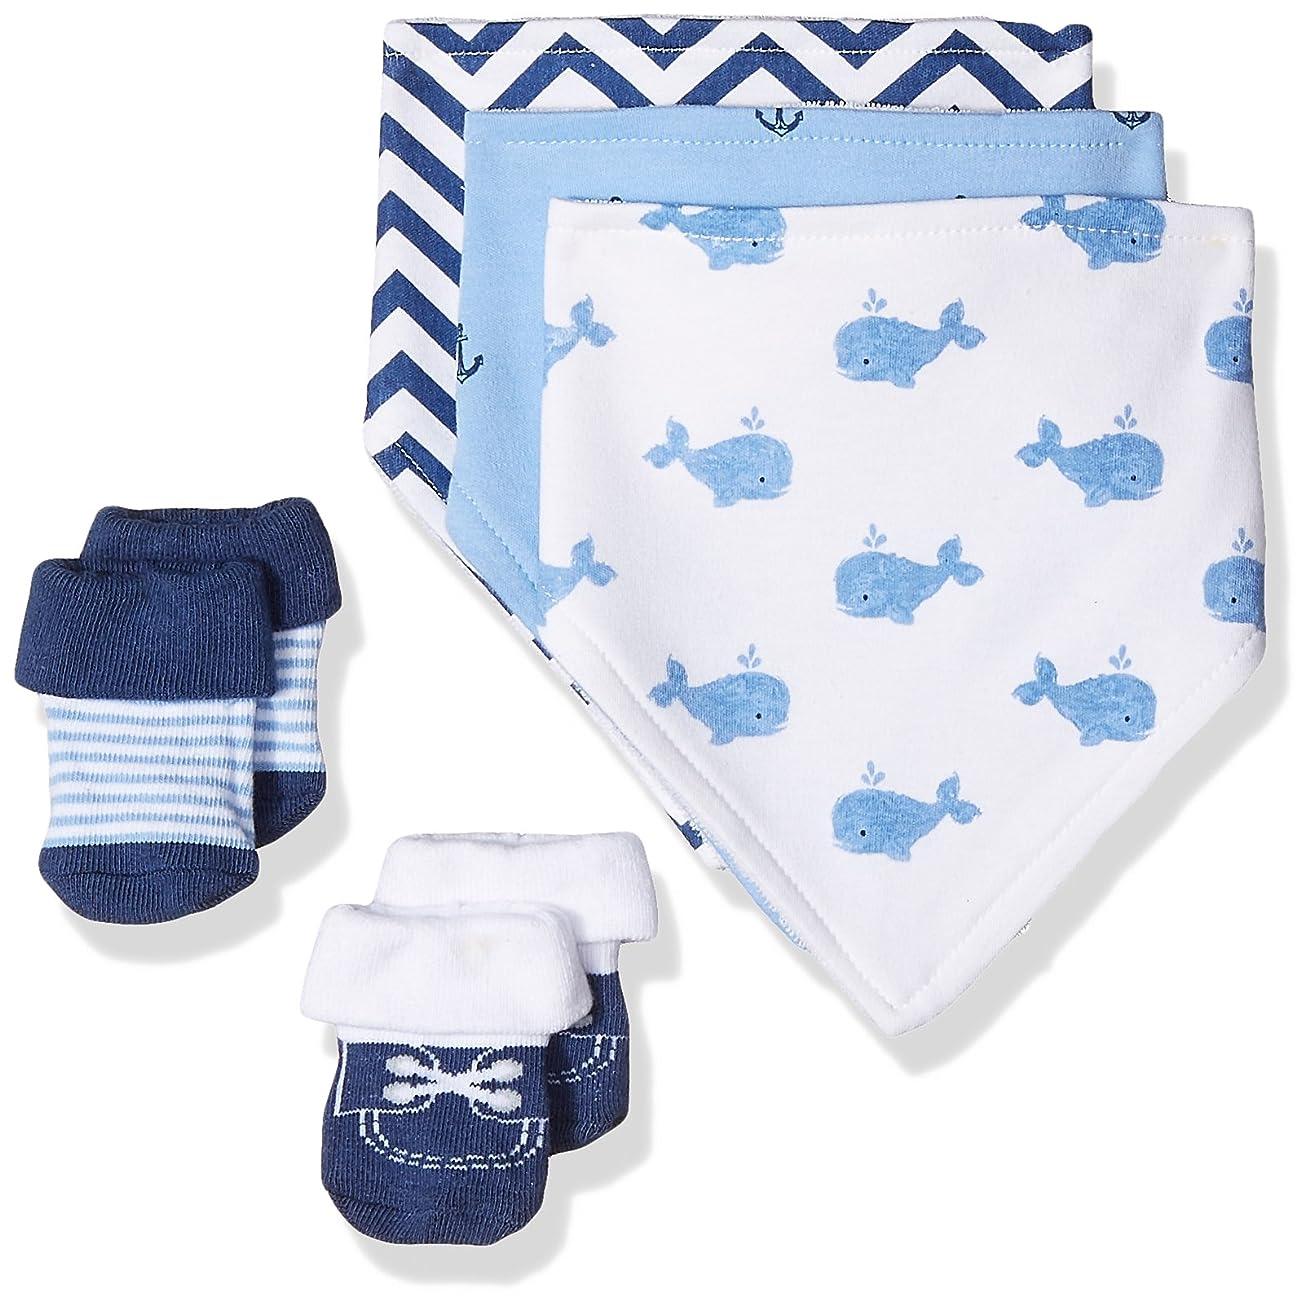 Hudson Baby Baby Bandana Bib & Socks Set